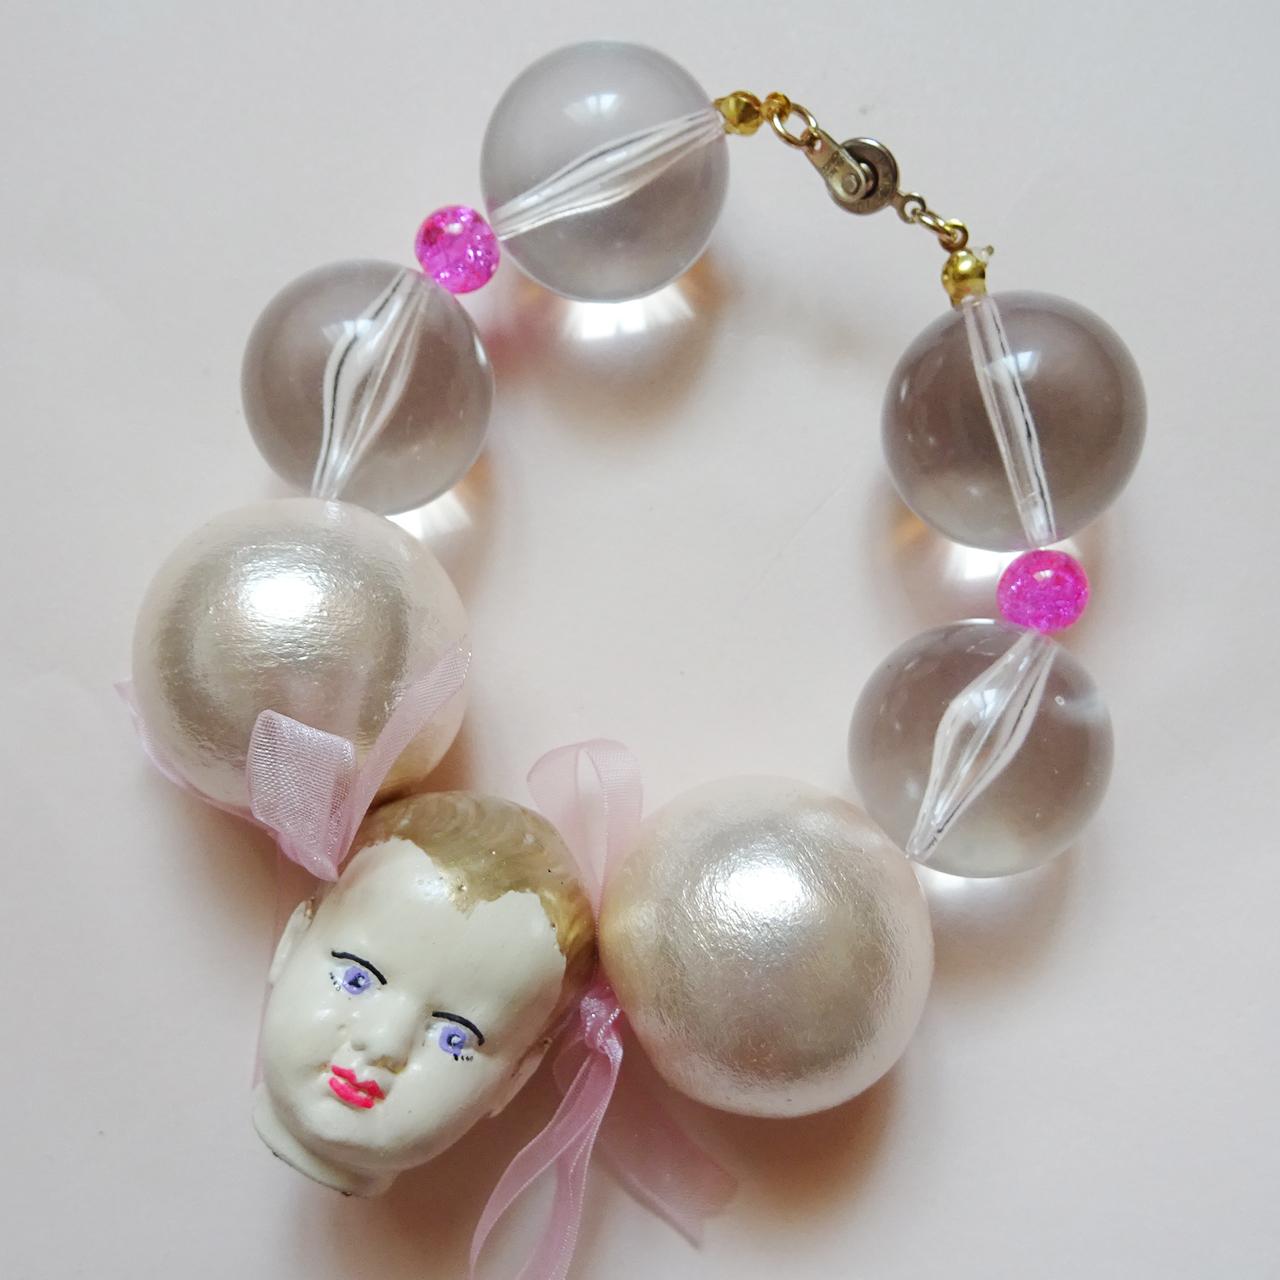 Sedmikrasky セドミックラスキー ドールヘッドブレスレット / ピンク